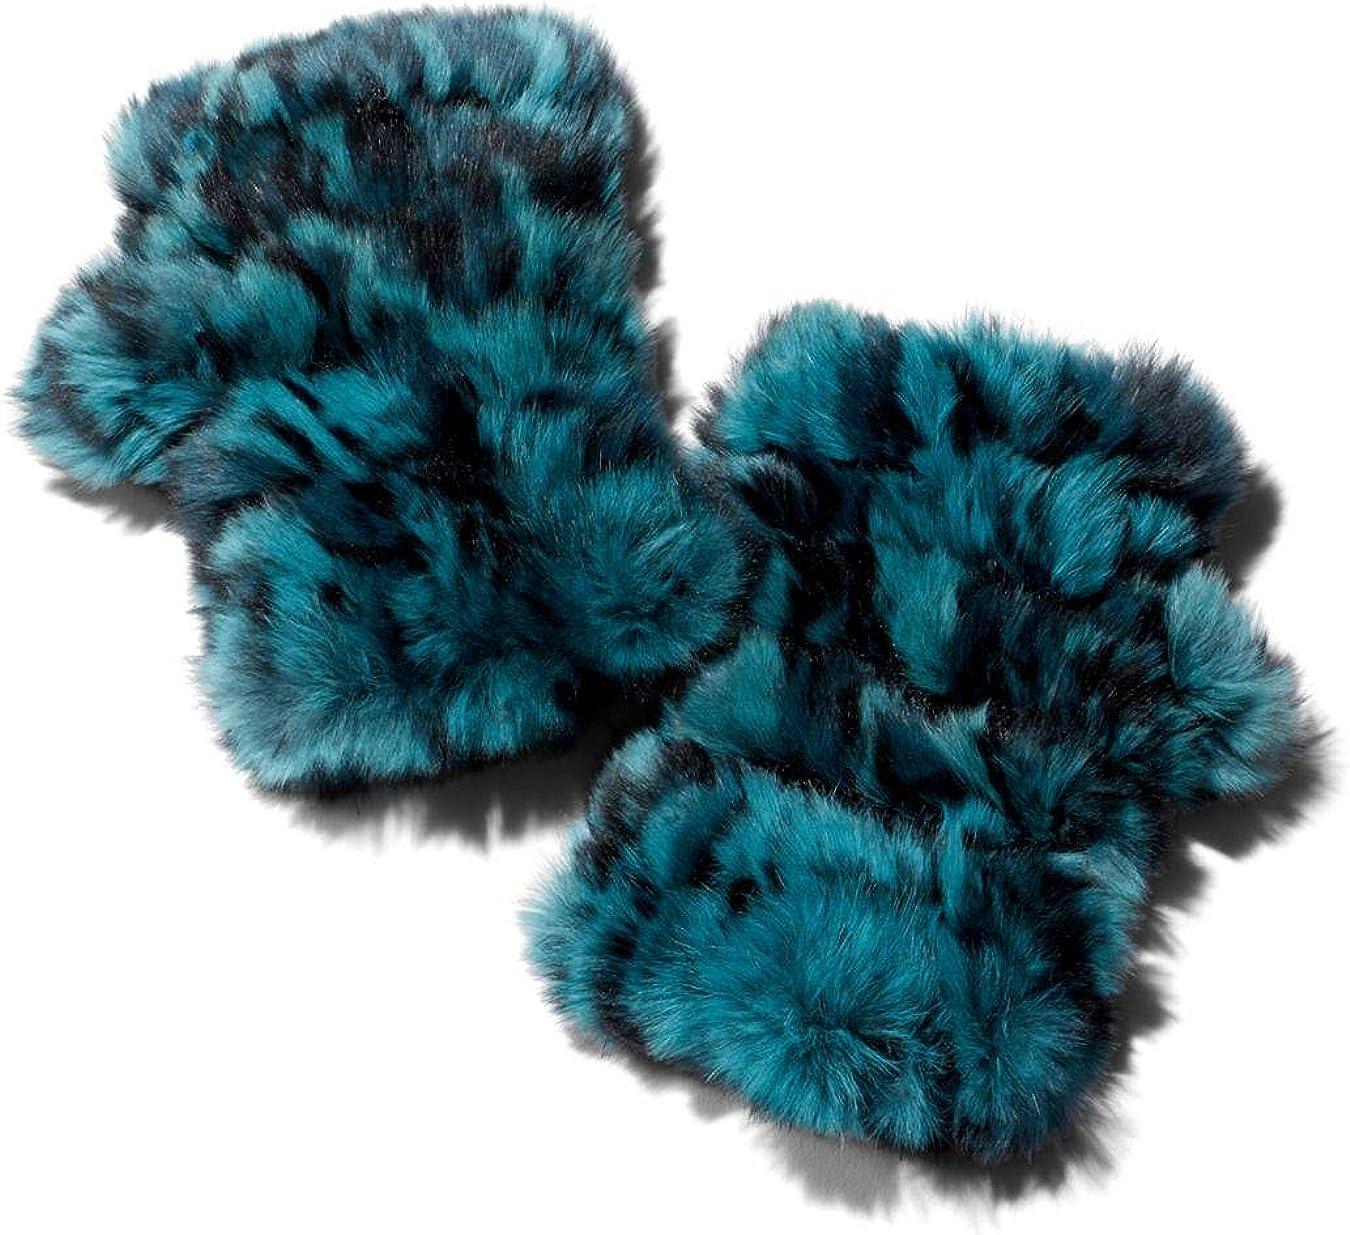 Designer Jocelyn Mandy Knit Rabbit-Fur Fingerless Mittens Green Blue